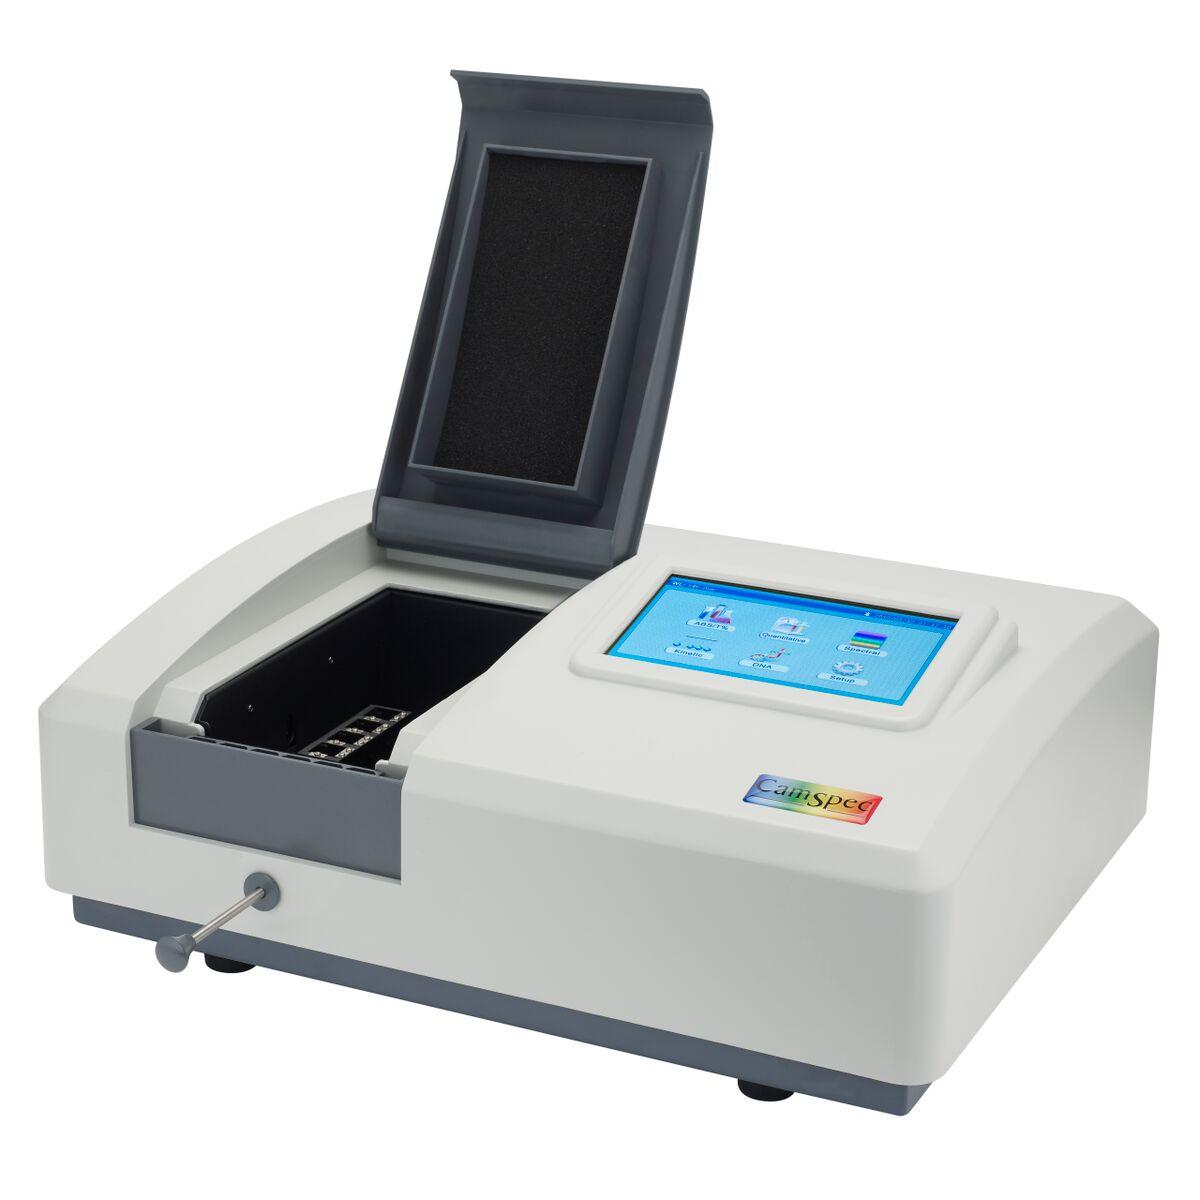 OSK 55DTM509T タッチパネル紫外可視分光光度計